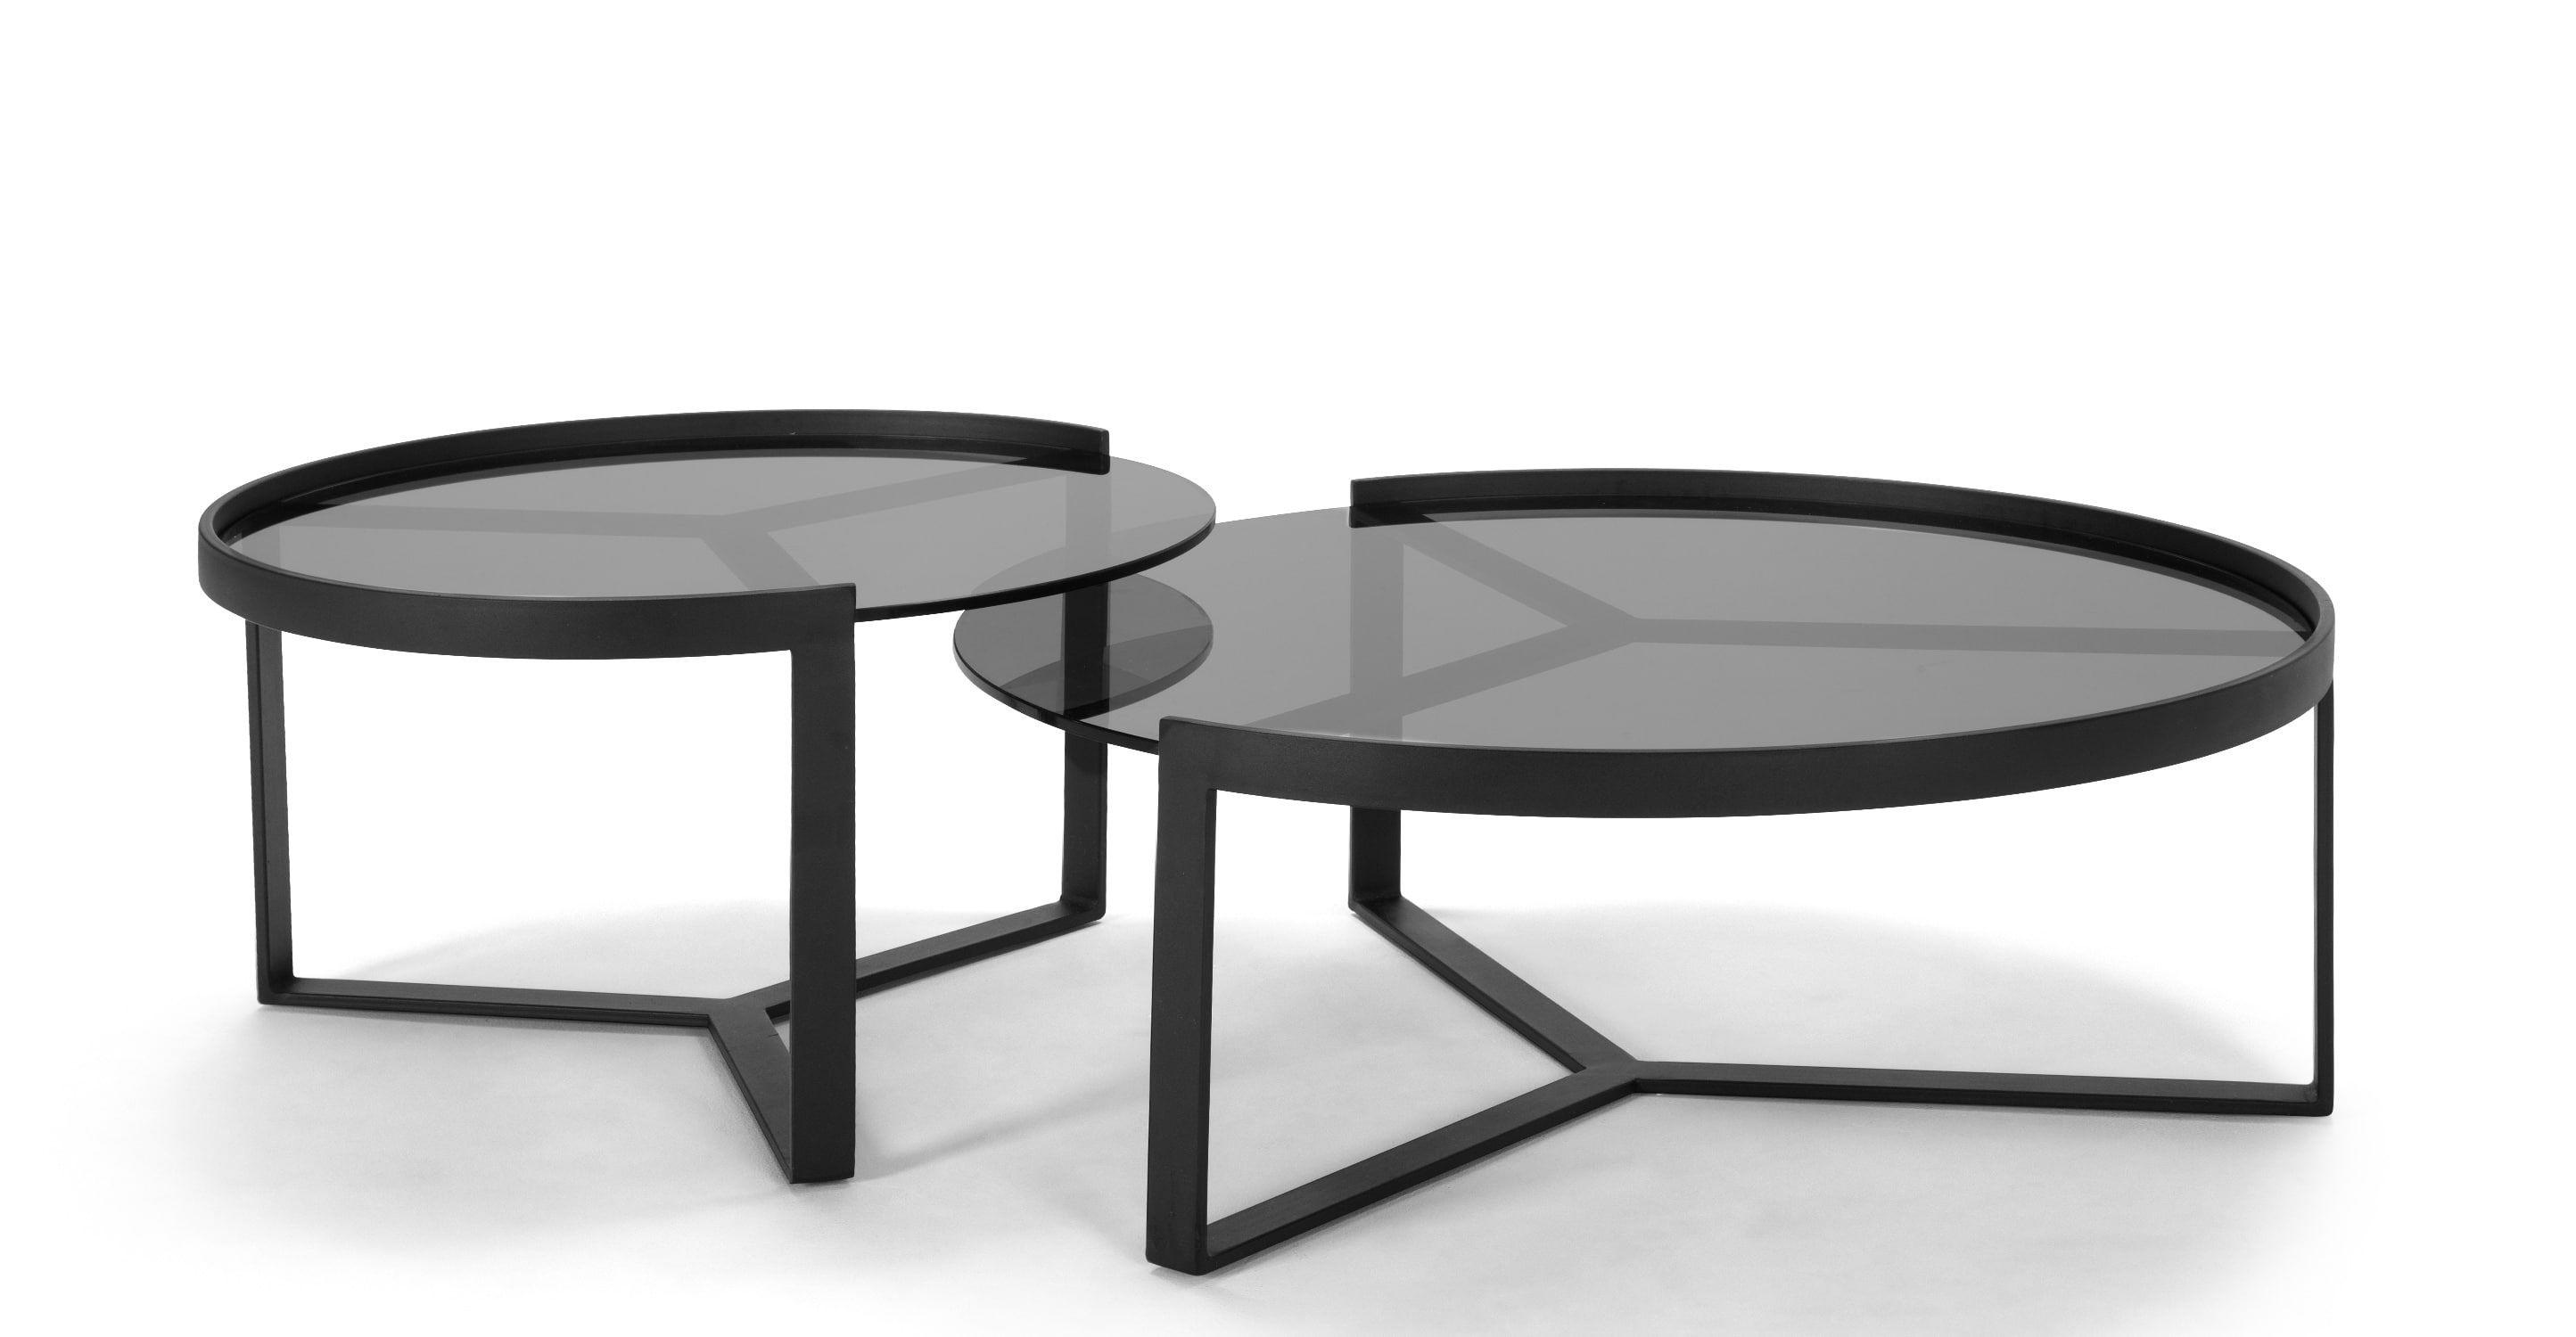 Aula Nesting Coffee Table Black Grey Coffee Table Nesting Coffee Tables Table Furniture [ 1500 x 2889 Pixel ]